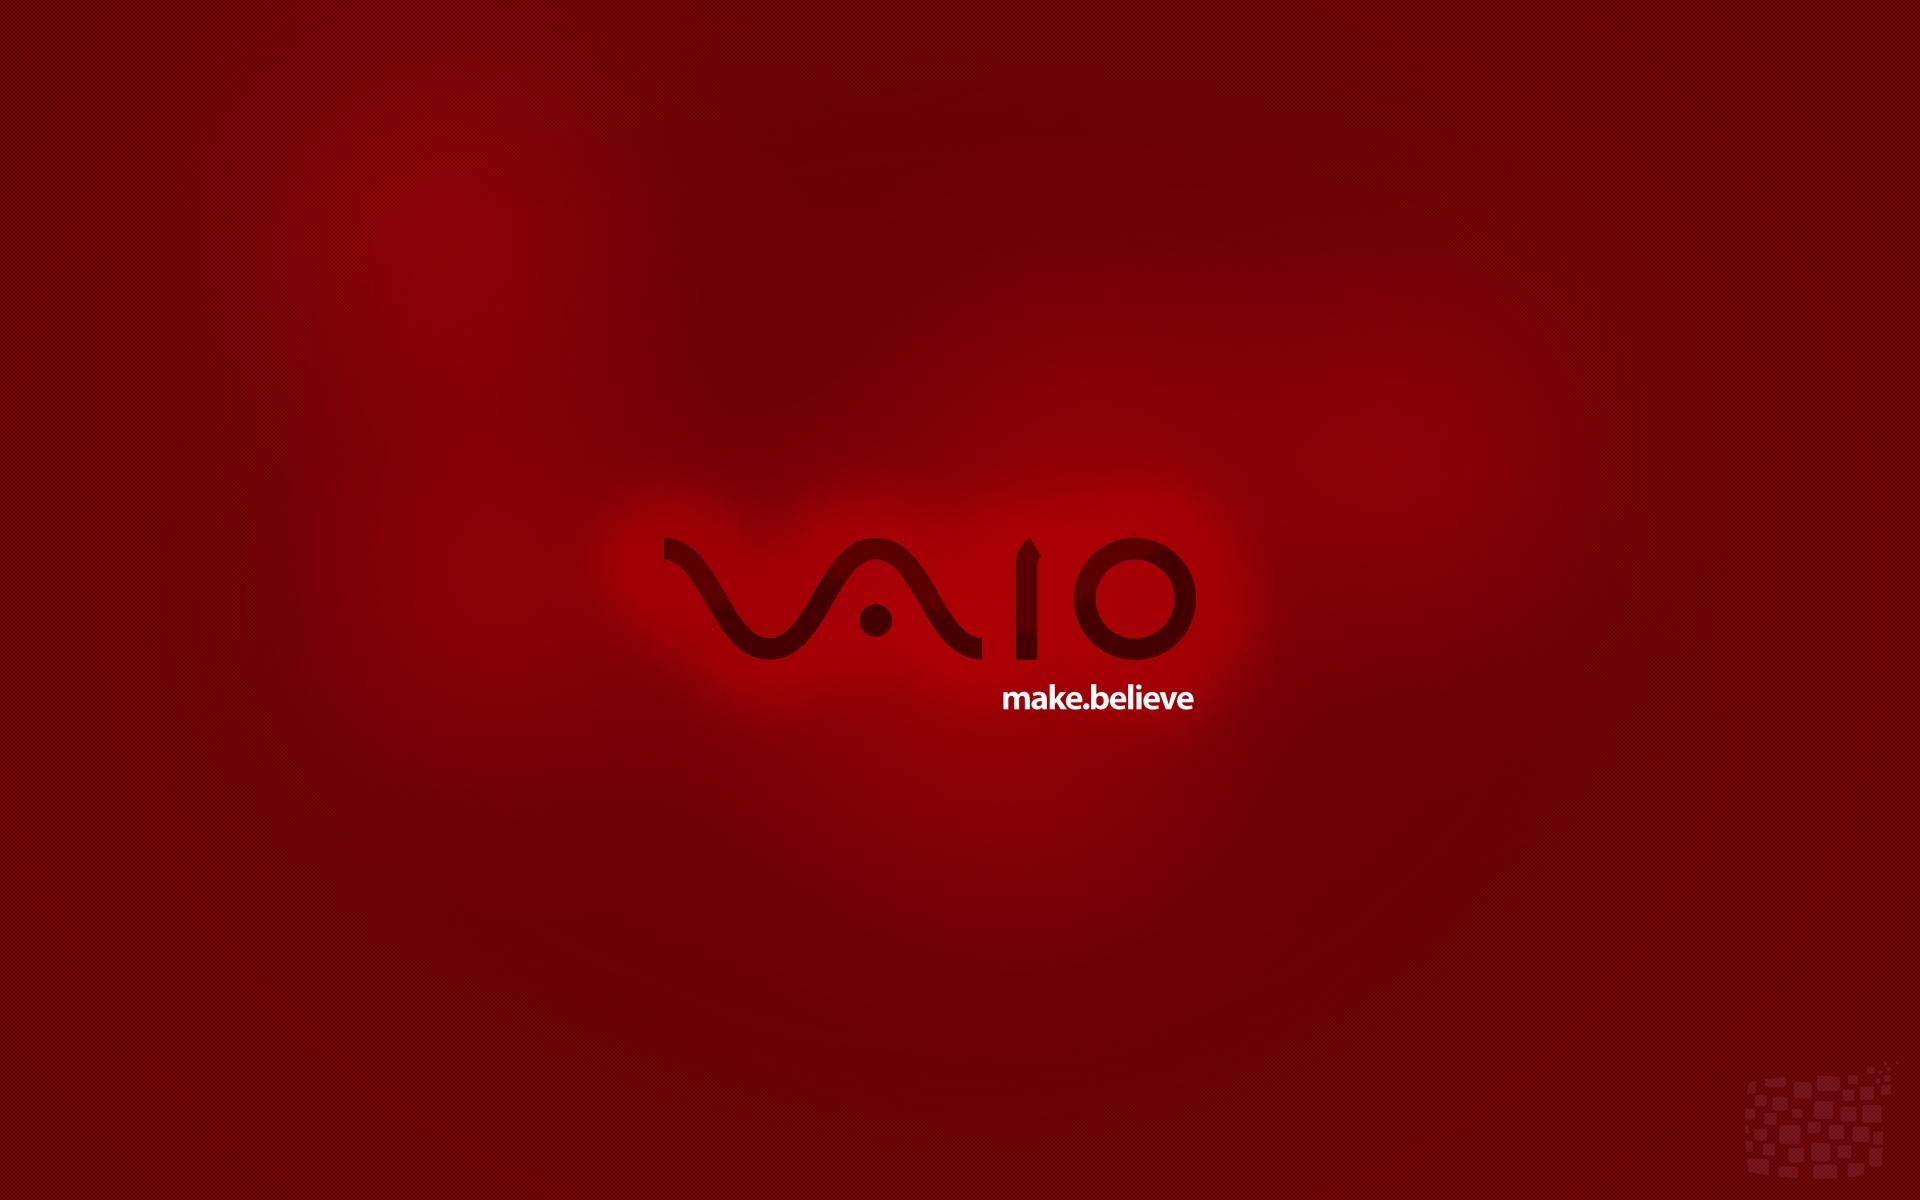 vaio wallpaper full hd